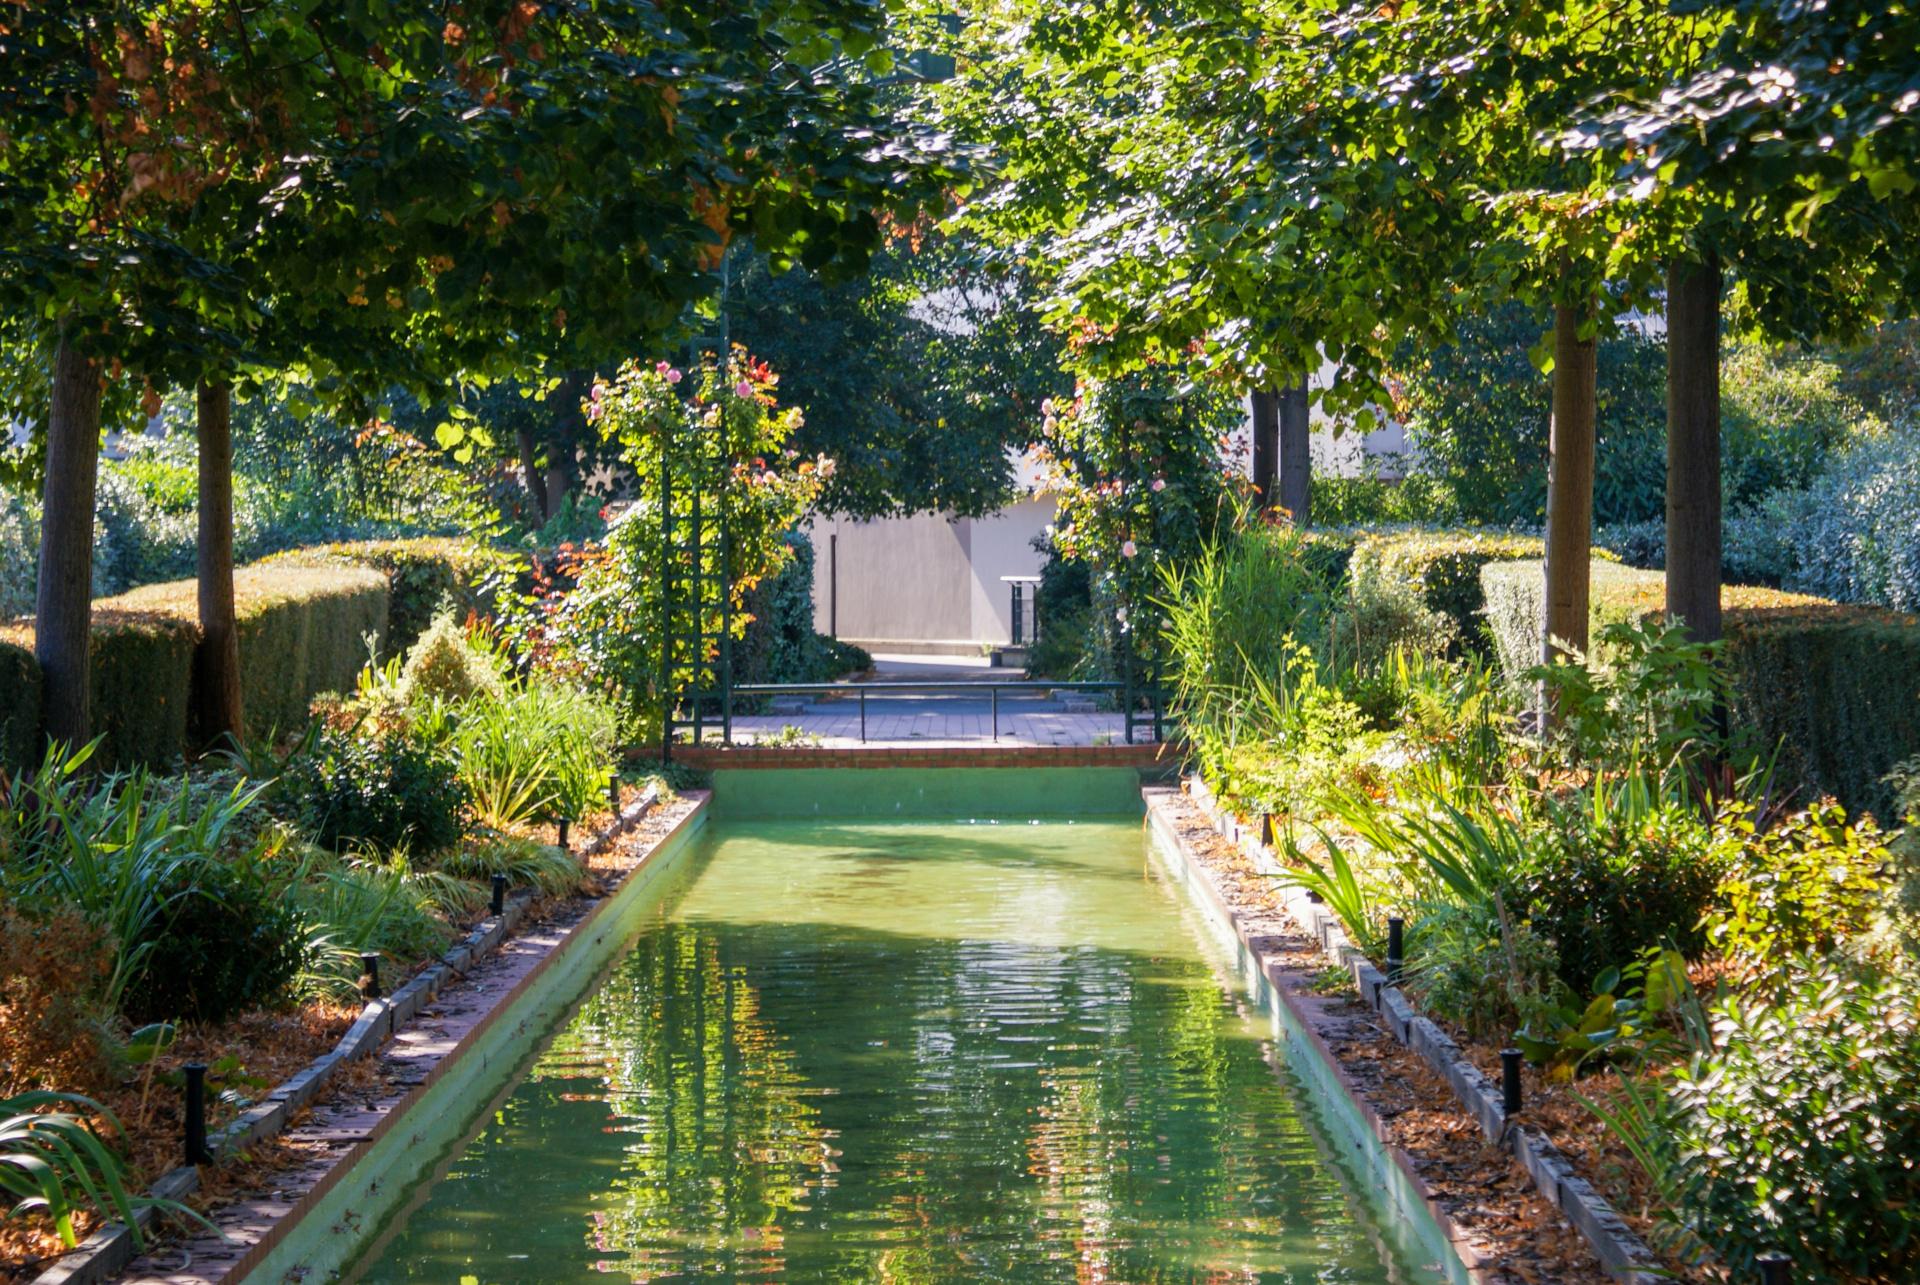 Enjoy Paris's Promenade Plantée nearby in the Vivarais vacation rental by Paris Perfect